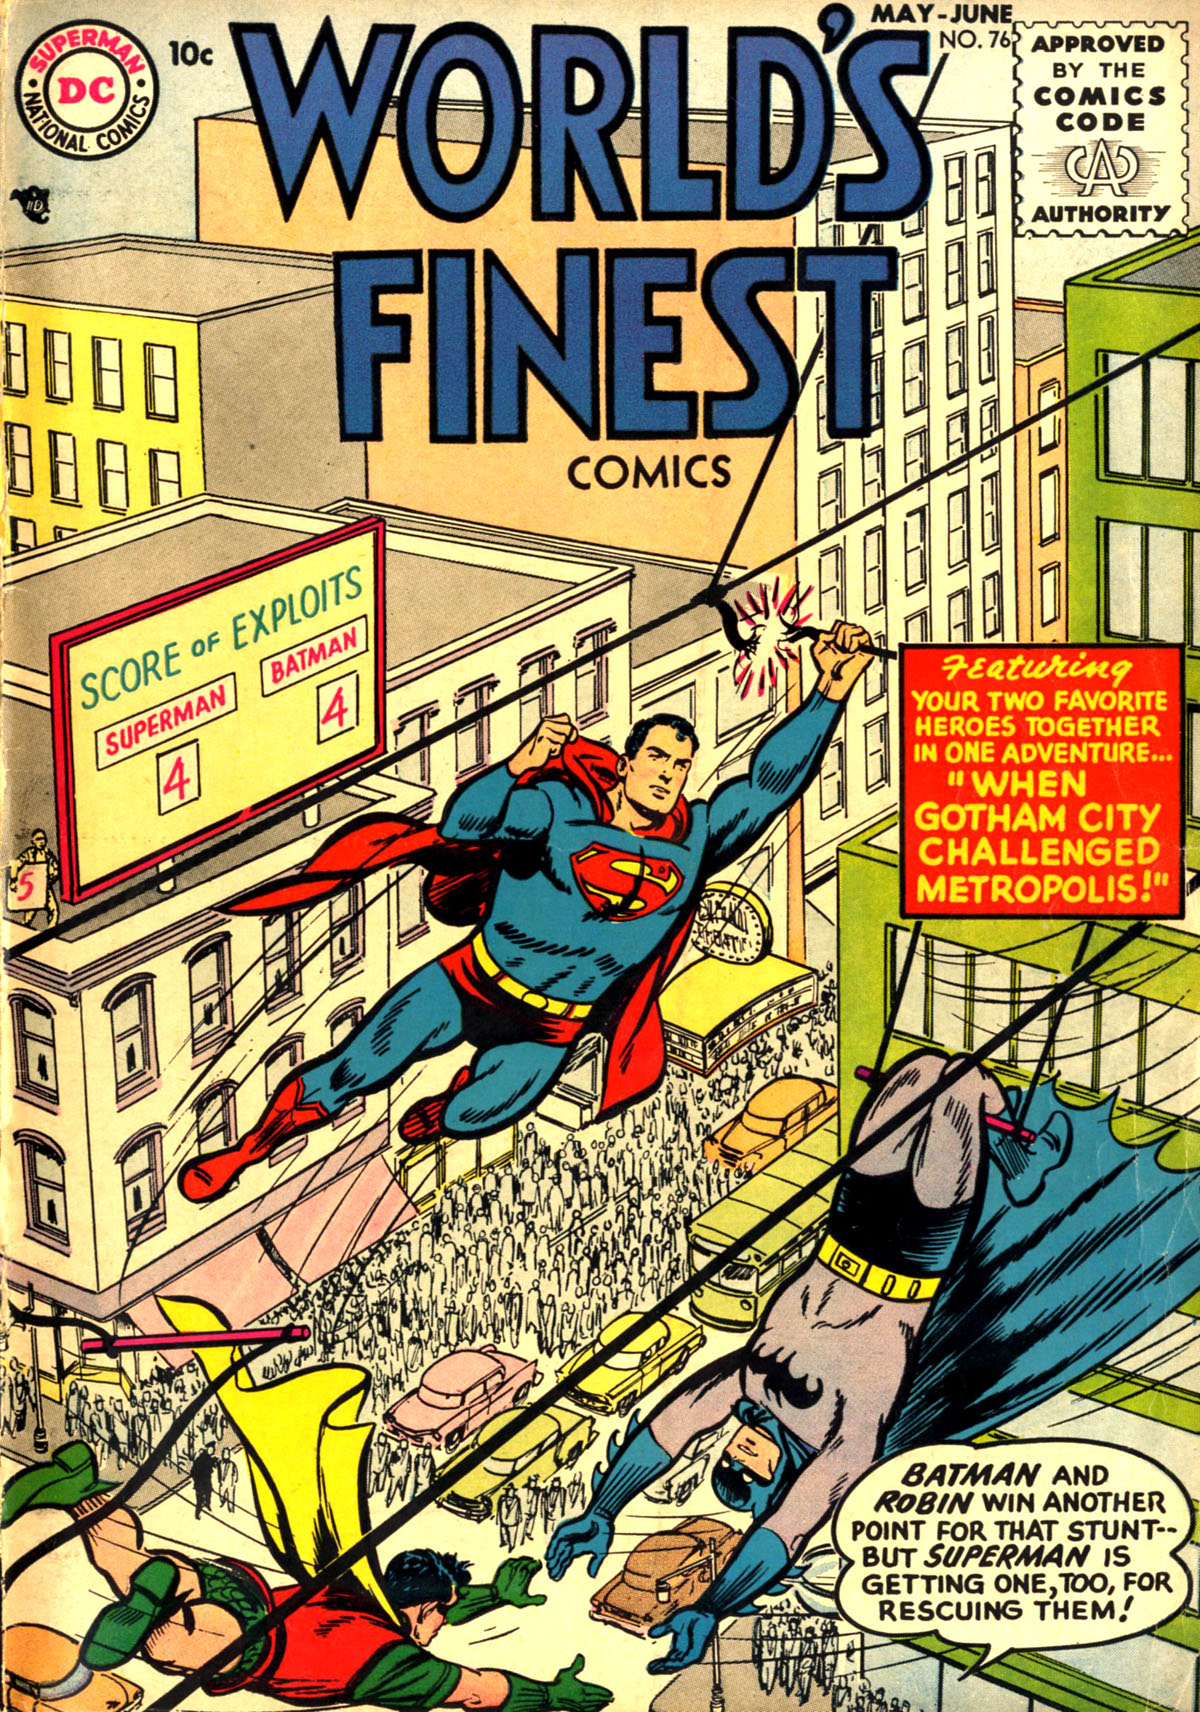 Read online World's Finest Comics comic -  Issue #76 - 1